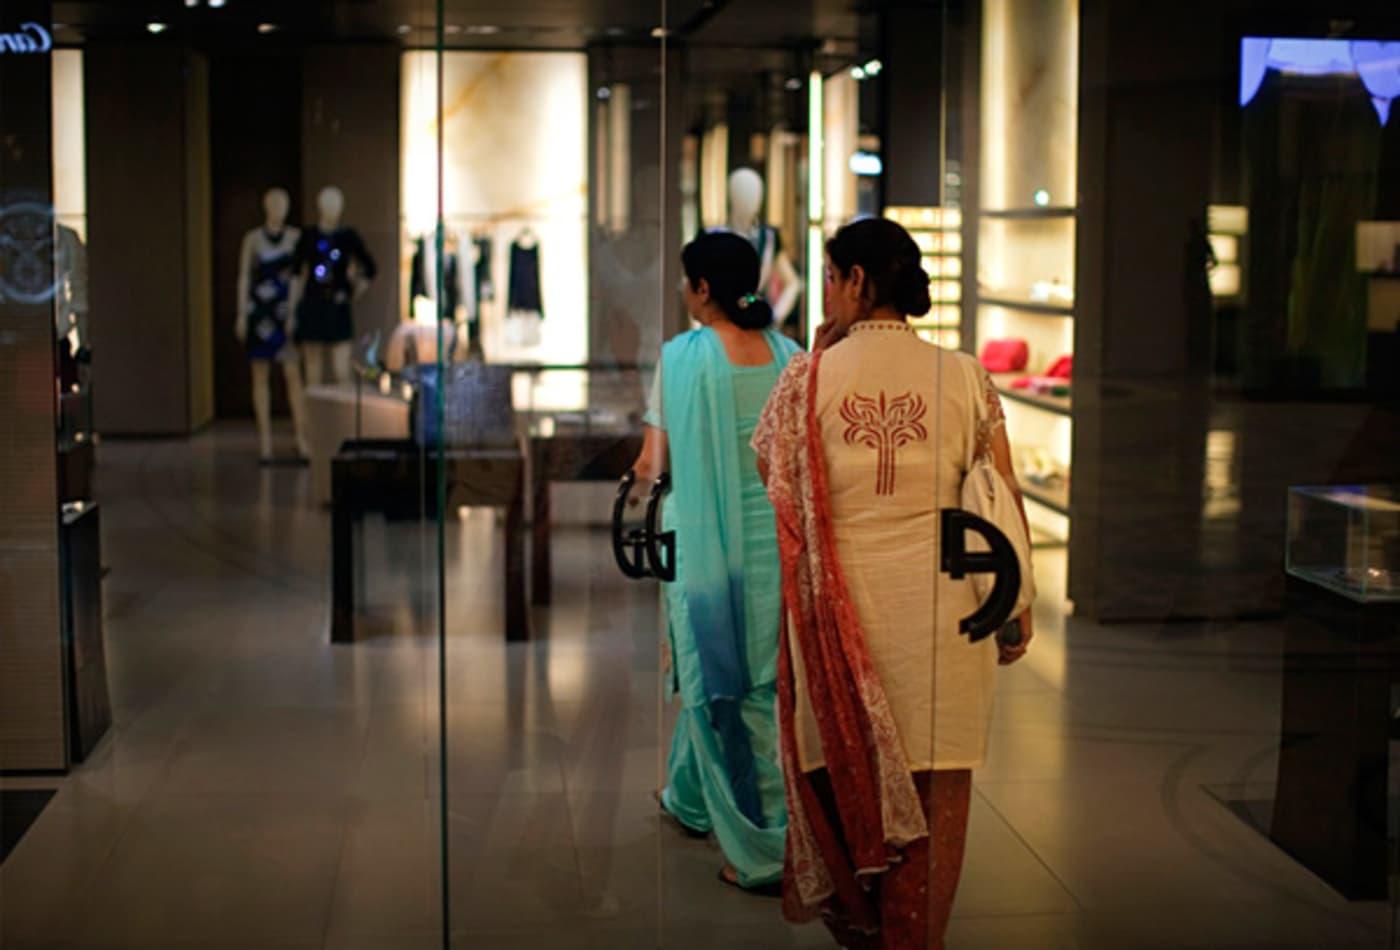 Retails-hottest-emerging-markets-2012-india.jpg